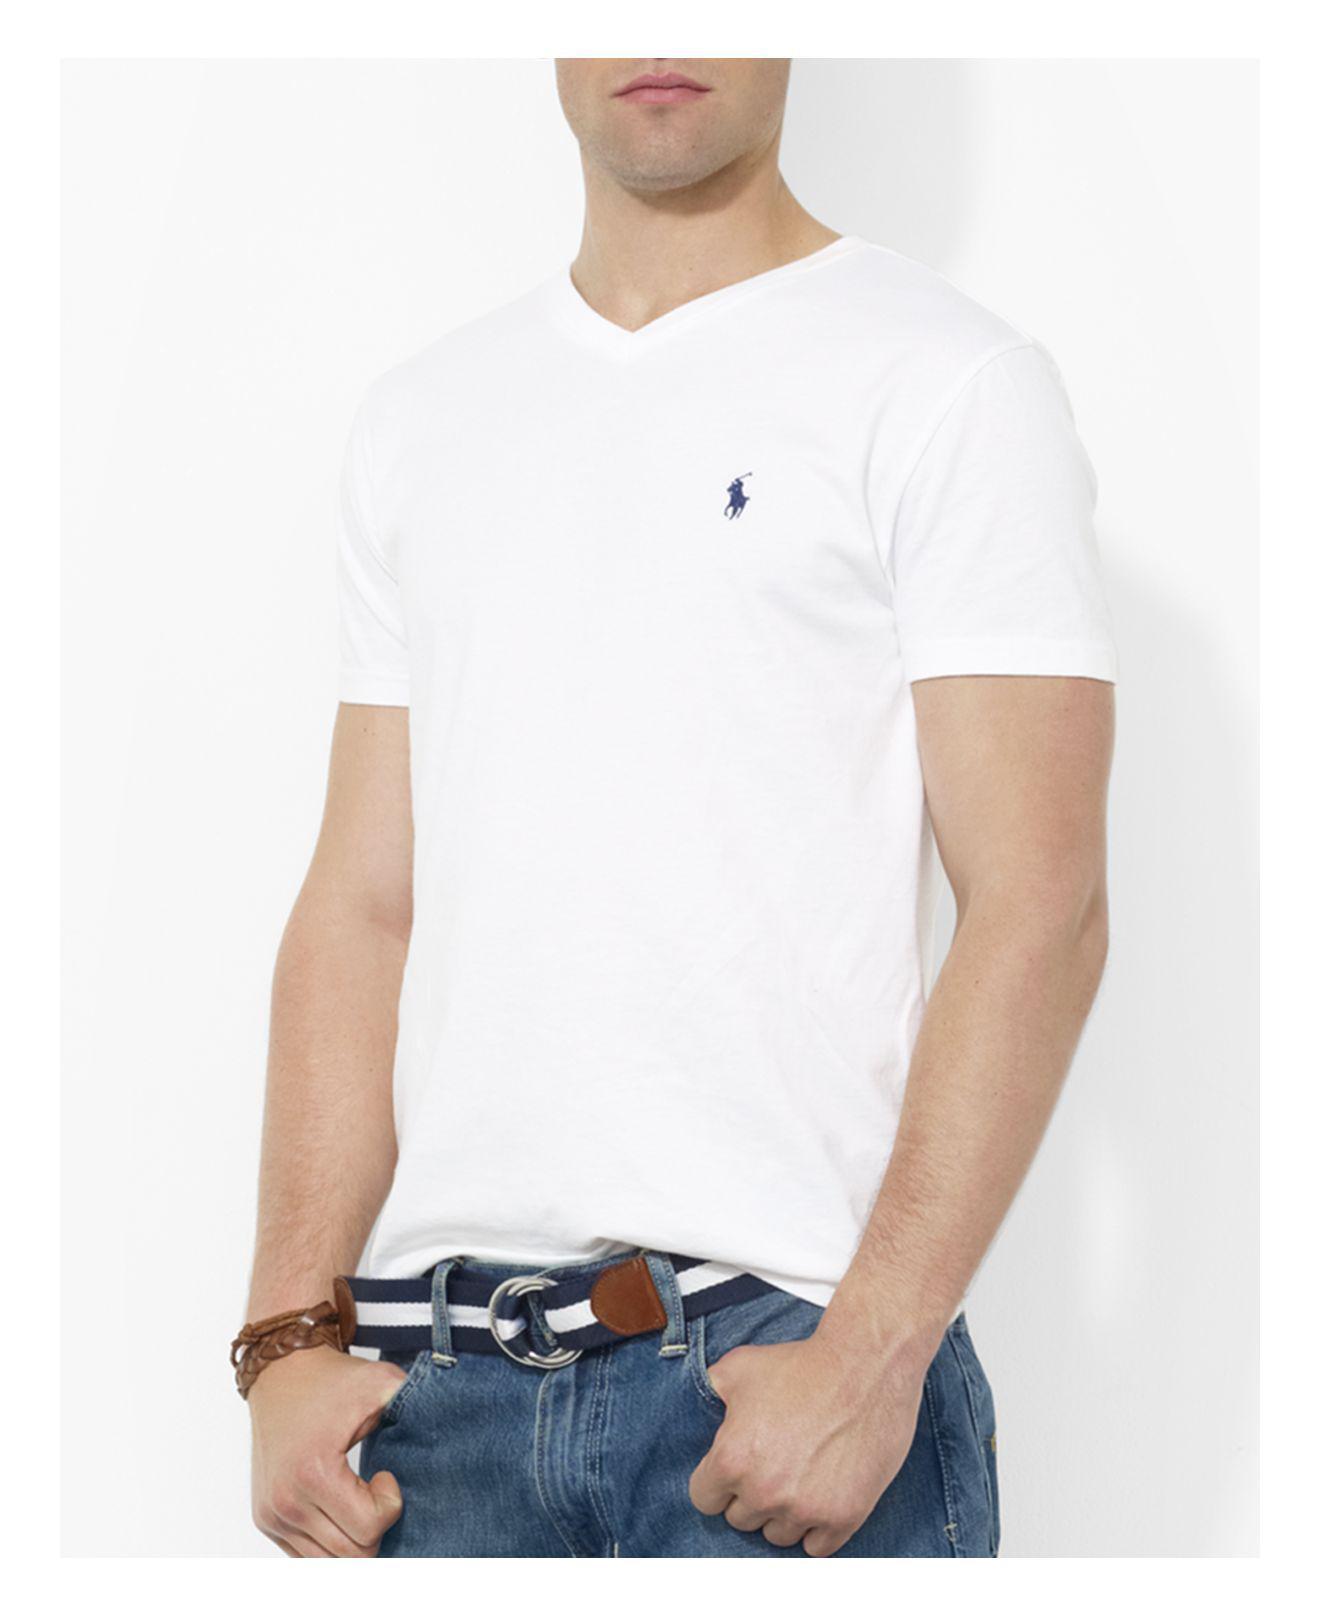 6a2b3e1539ba5 Lyst - Polo Ralph Lauren Cotton V Neck Tee in White for Men